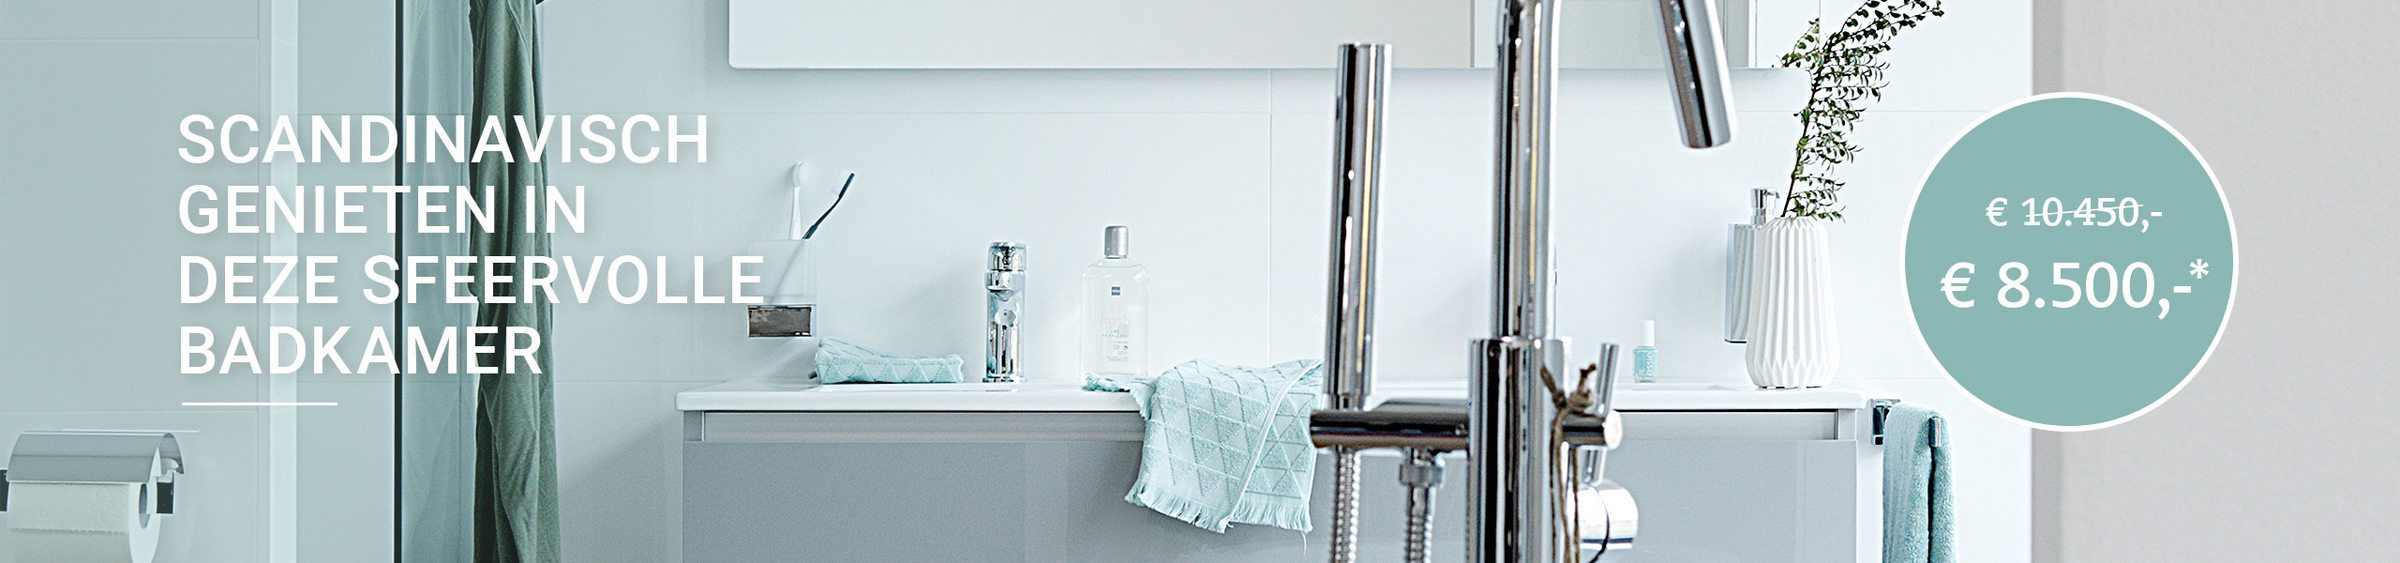 Scandinavische badkamer - Scandinavische badkamer